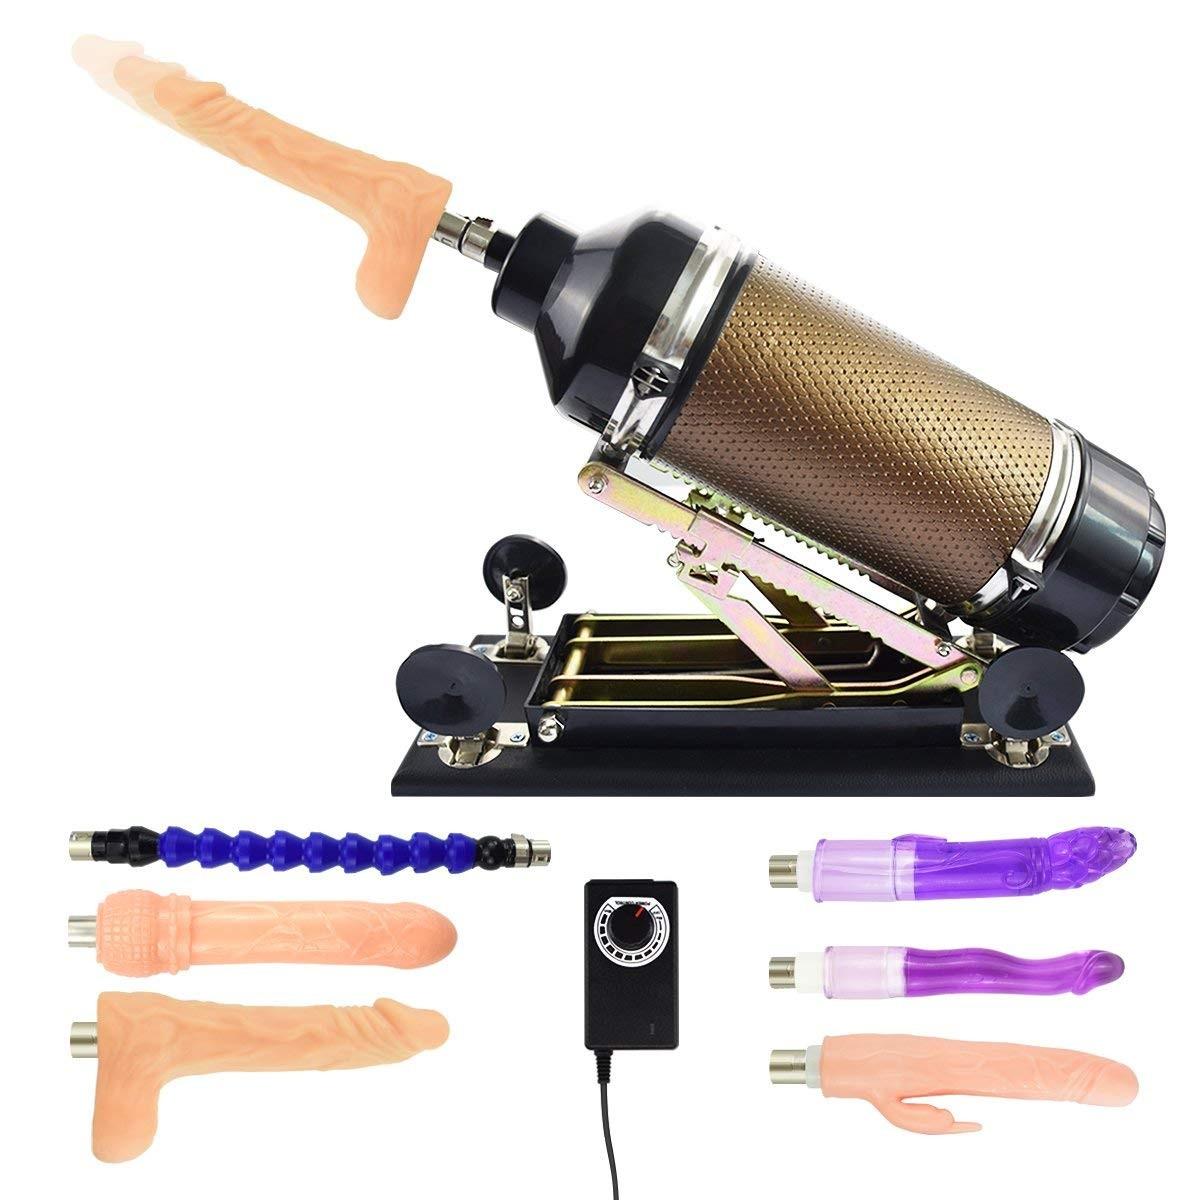 Deep Thrusting Rabbit Clitoral Vibrator